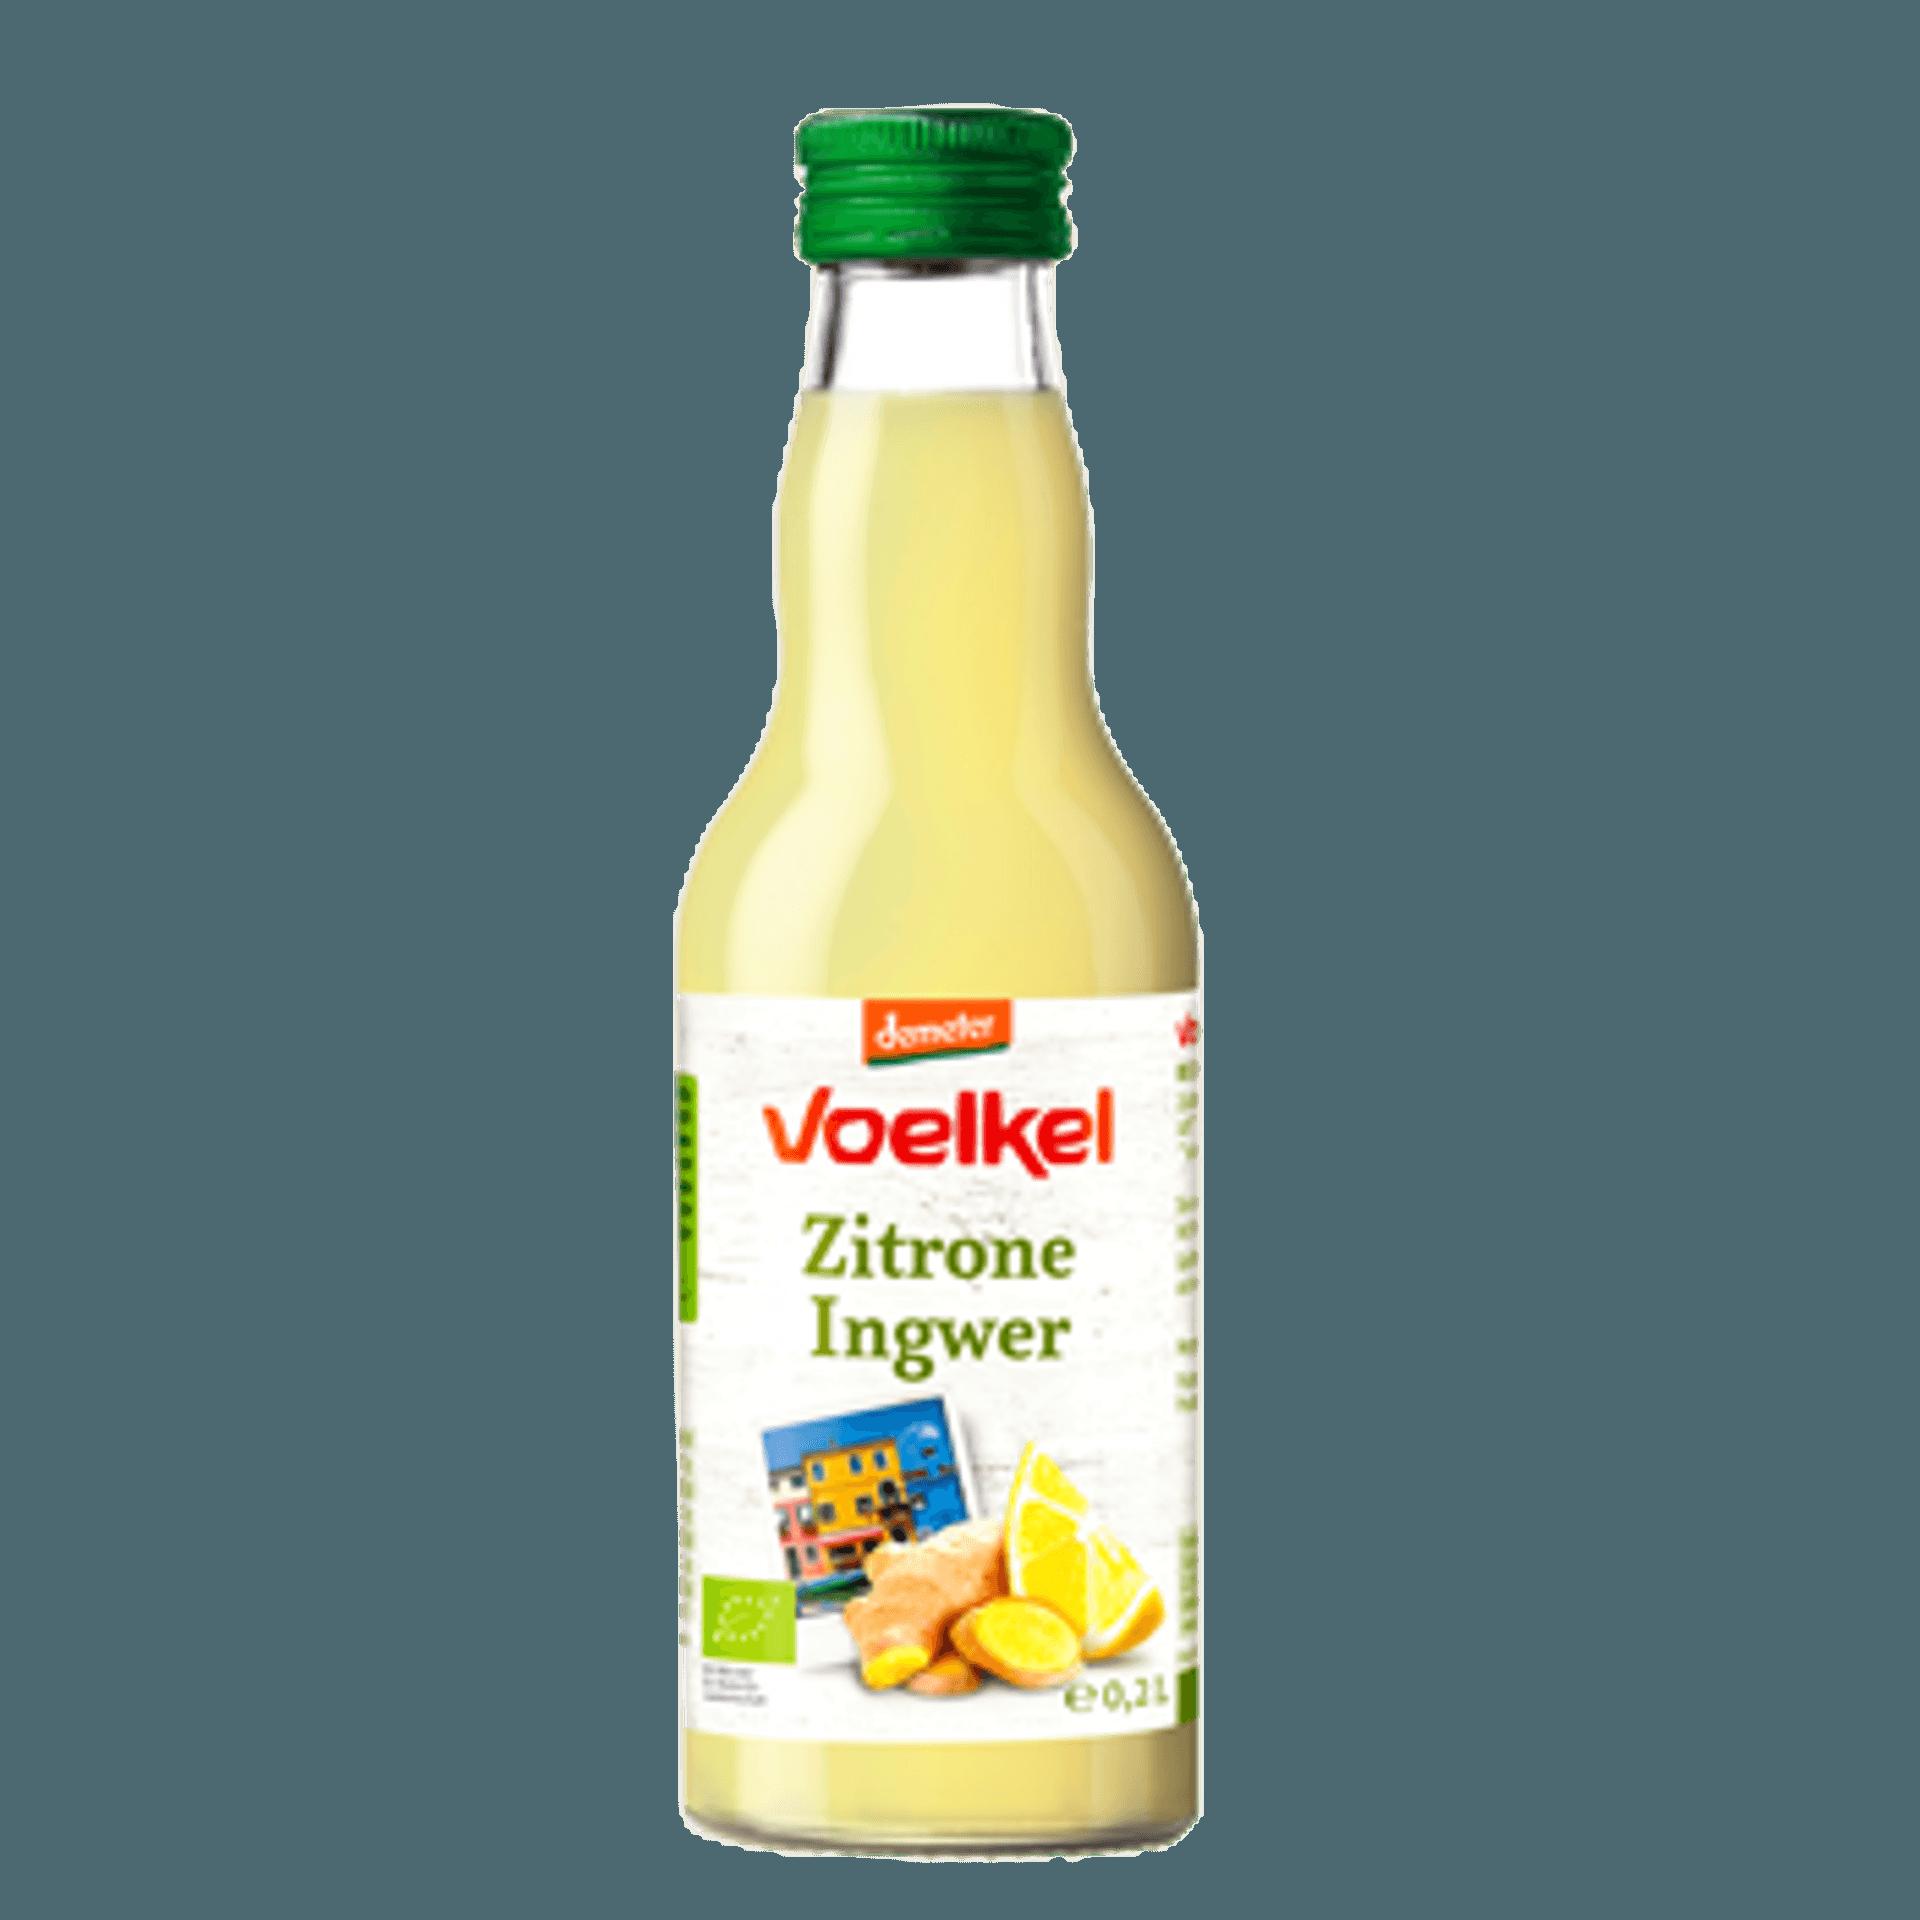 Zitrone, Ingwer, Getränk